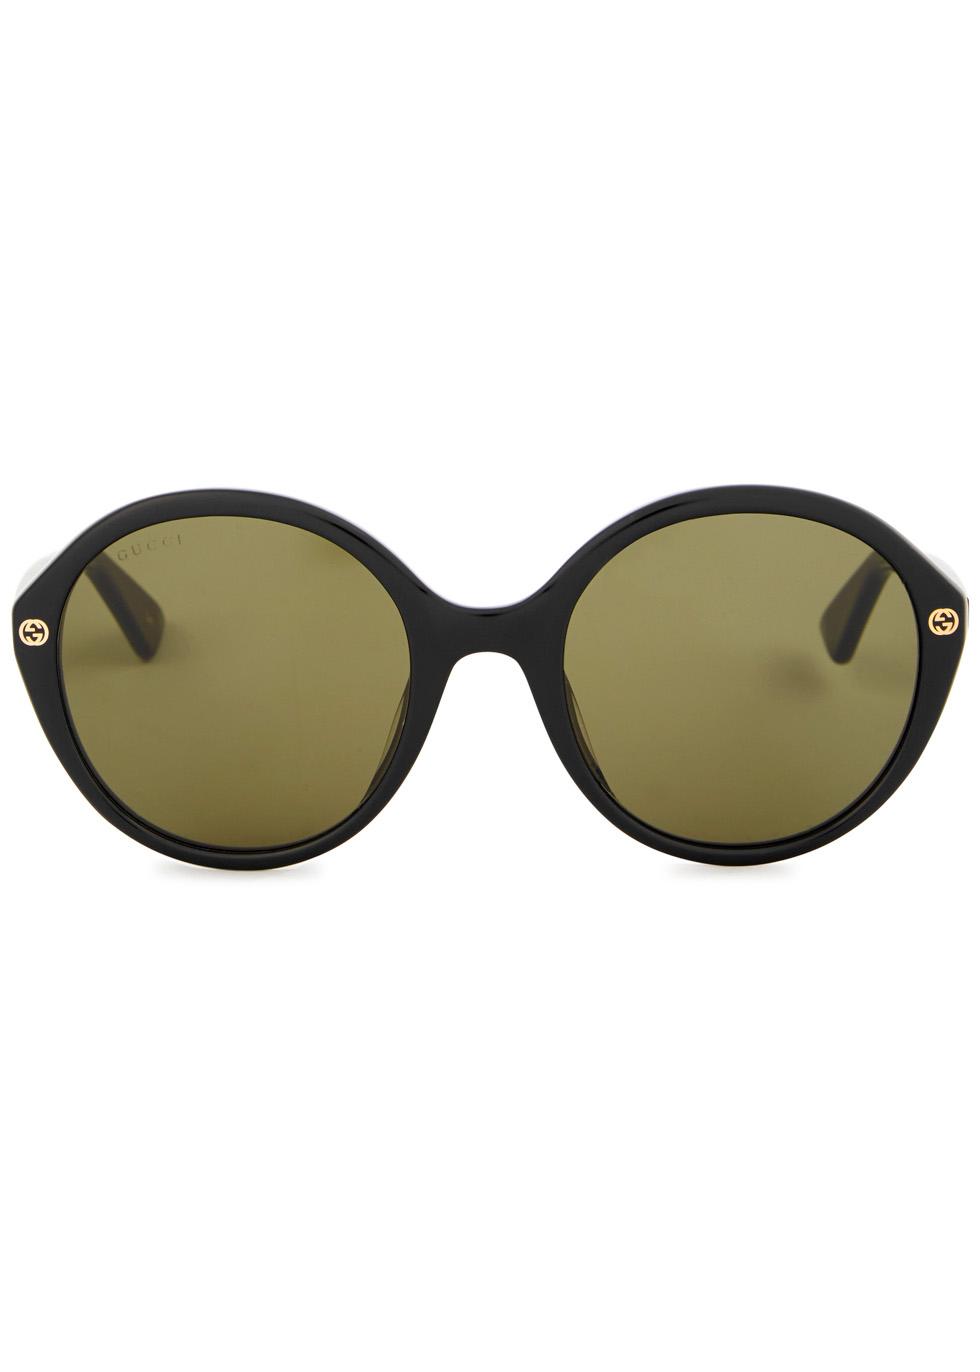 GG black round-frame sunglasses - Gucci